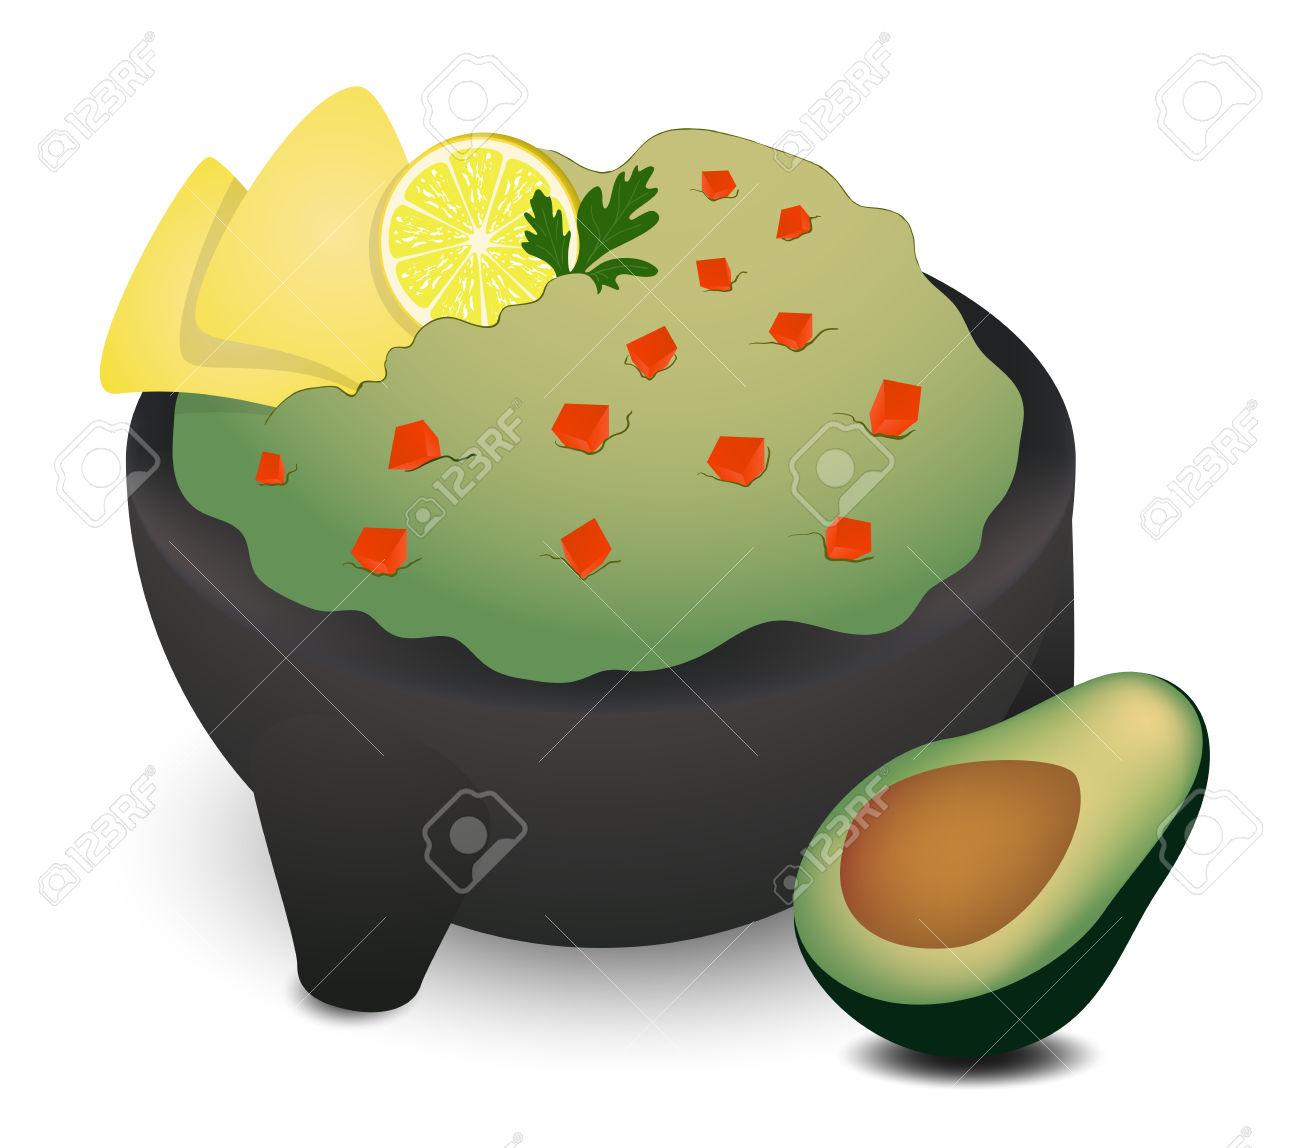 Avocado clipart cartoon. Chip guacamole pencil and